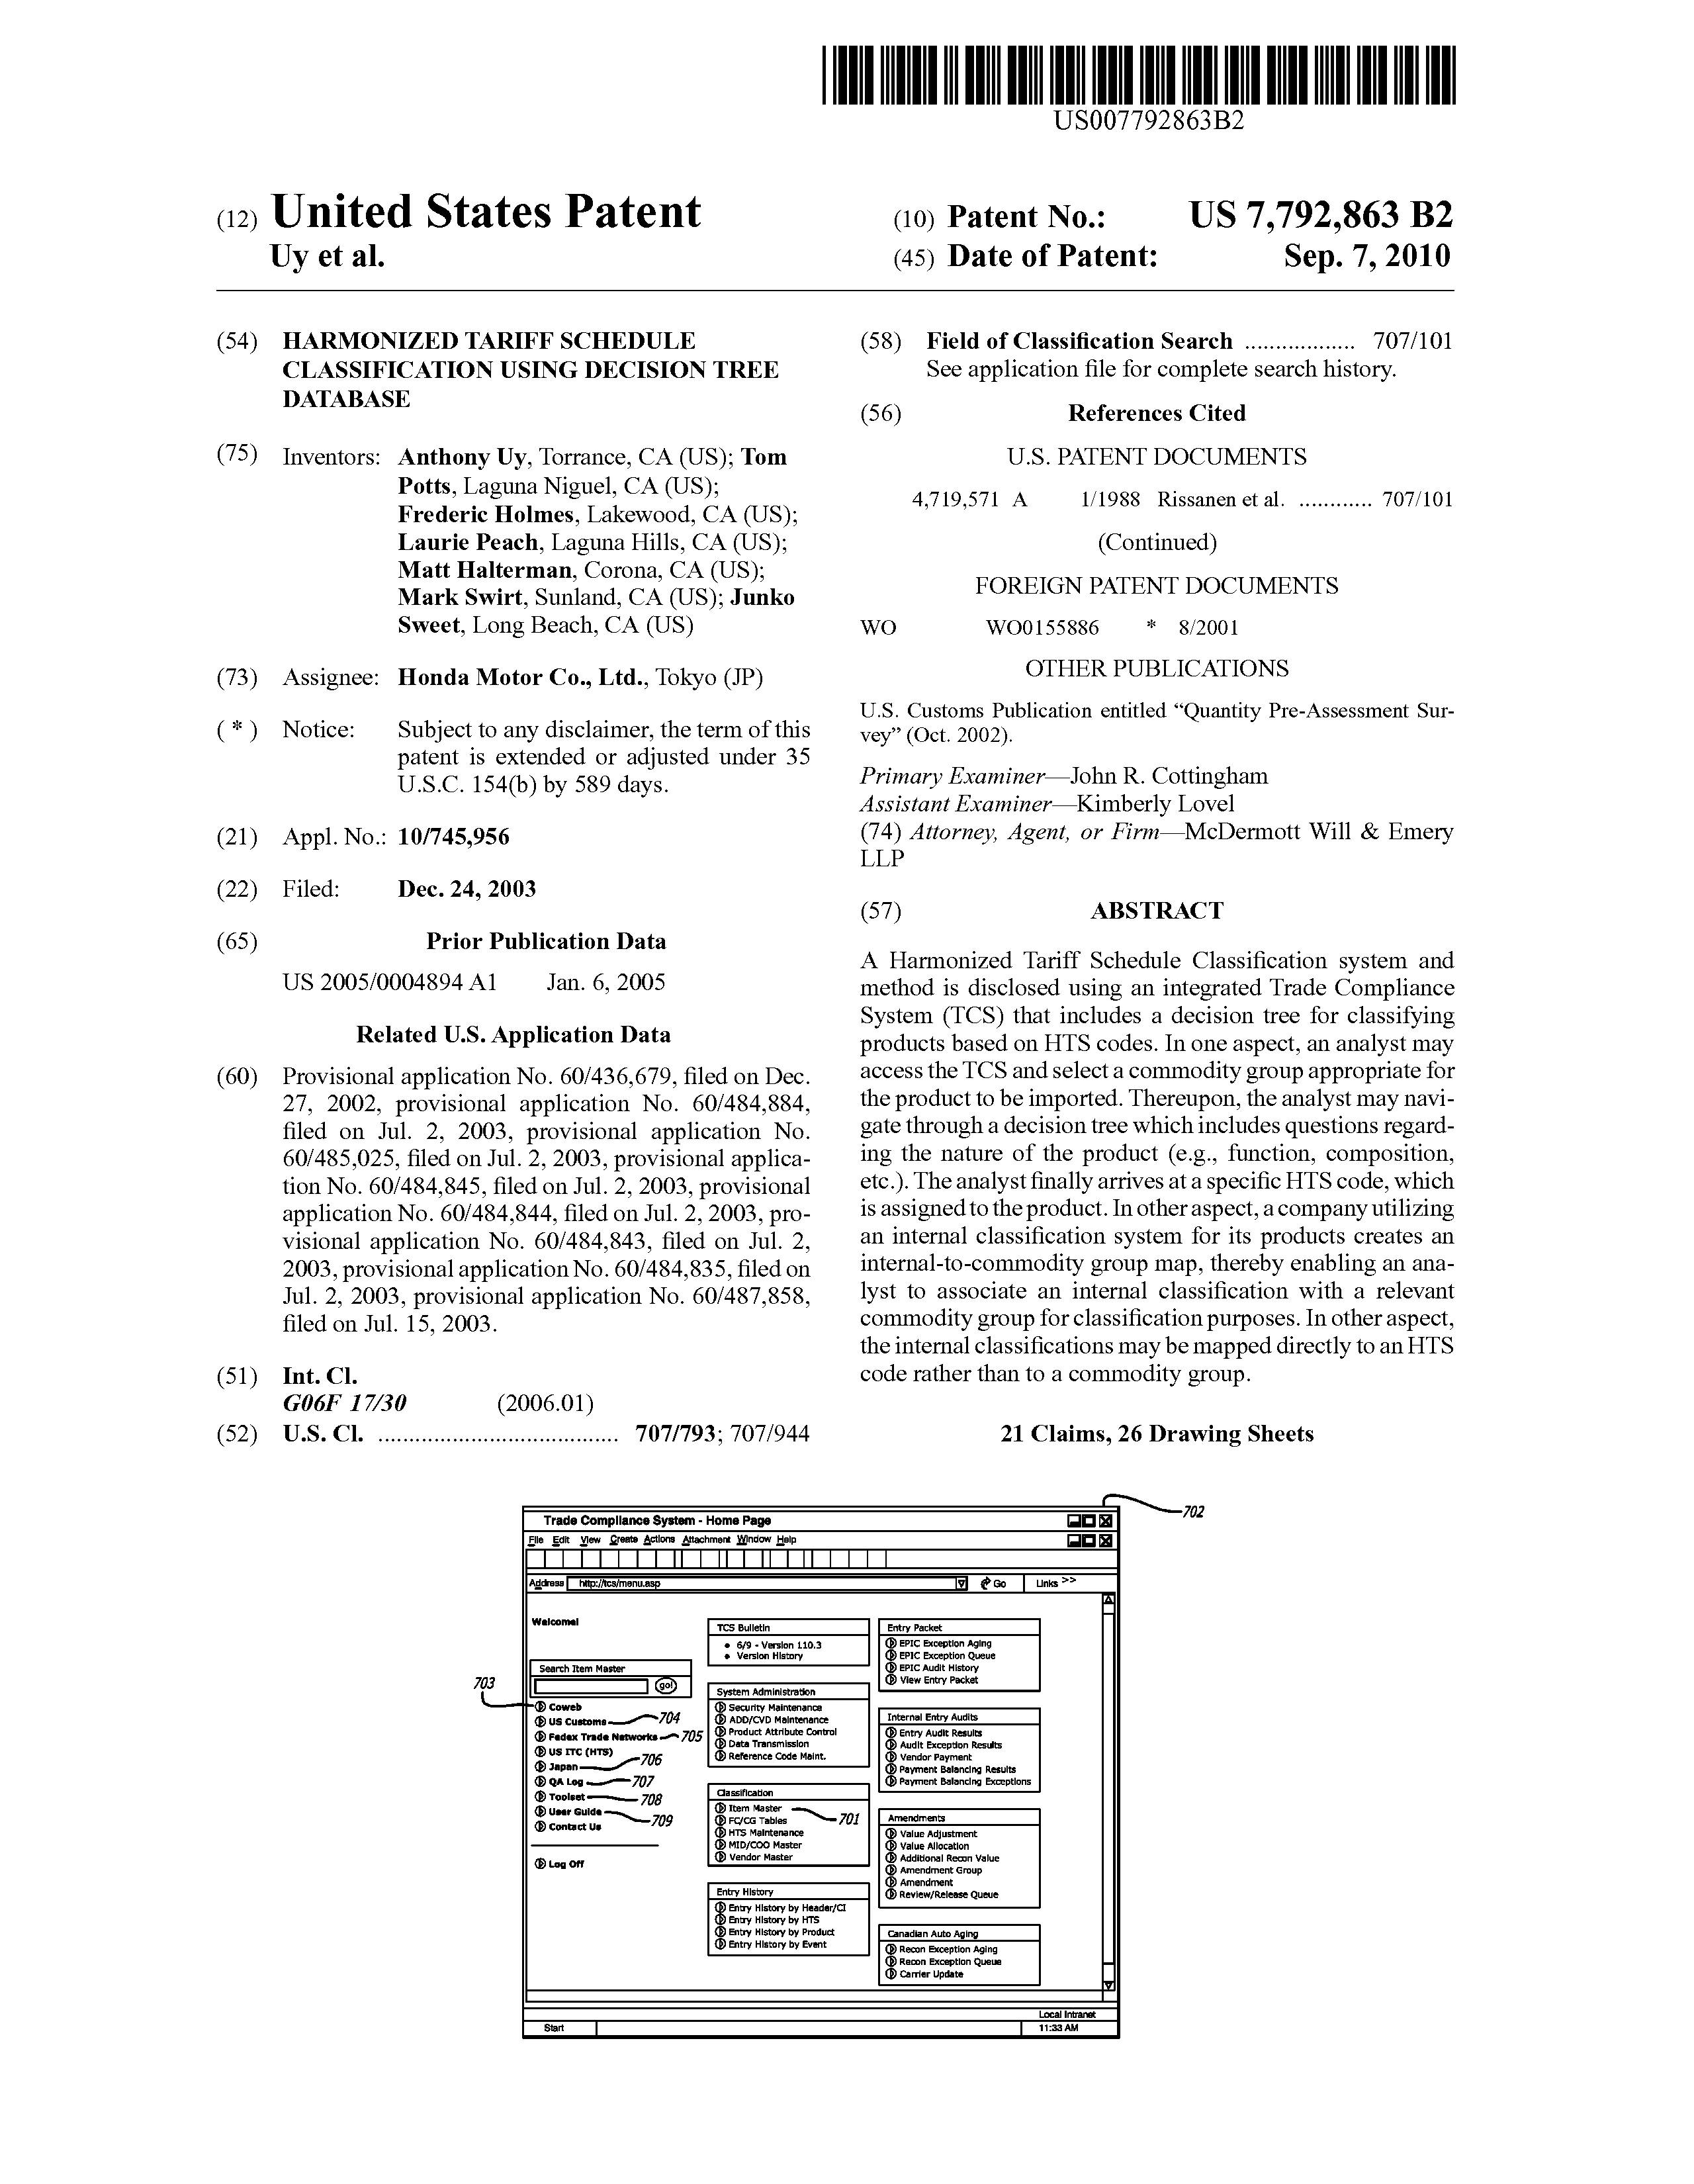 US 7792863 B2 - Harmonized Tariff Schedule Classification